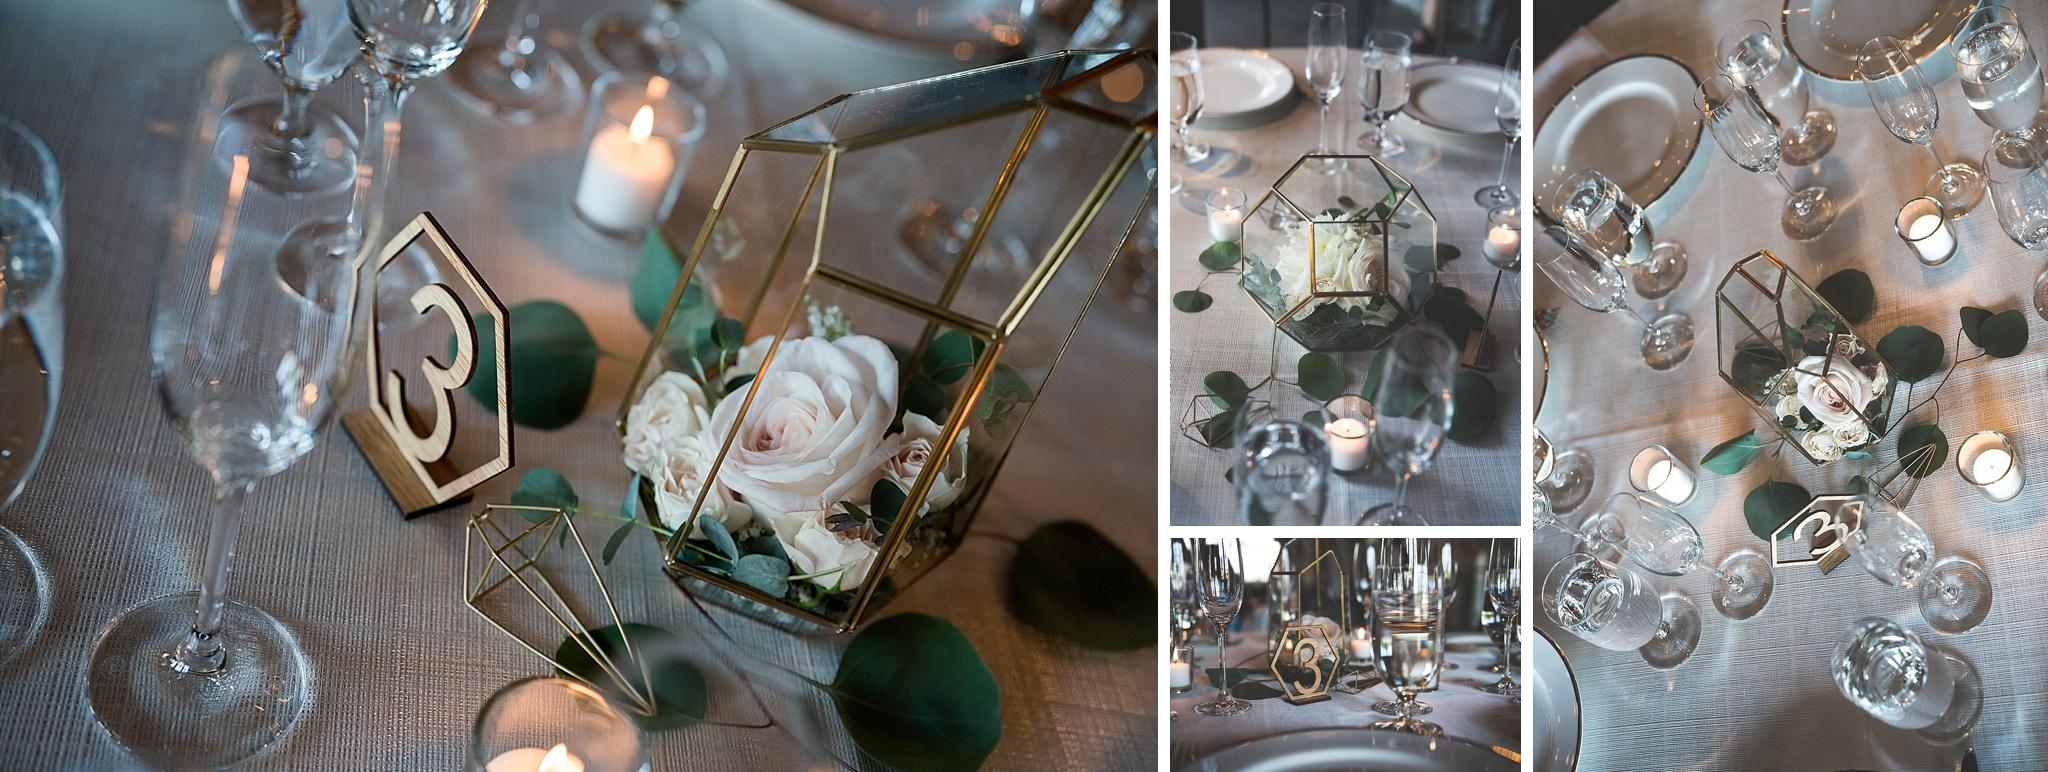 Rickhouse-Durham-NC-Wedding-Photographer-059.jpg